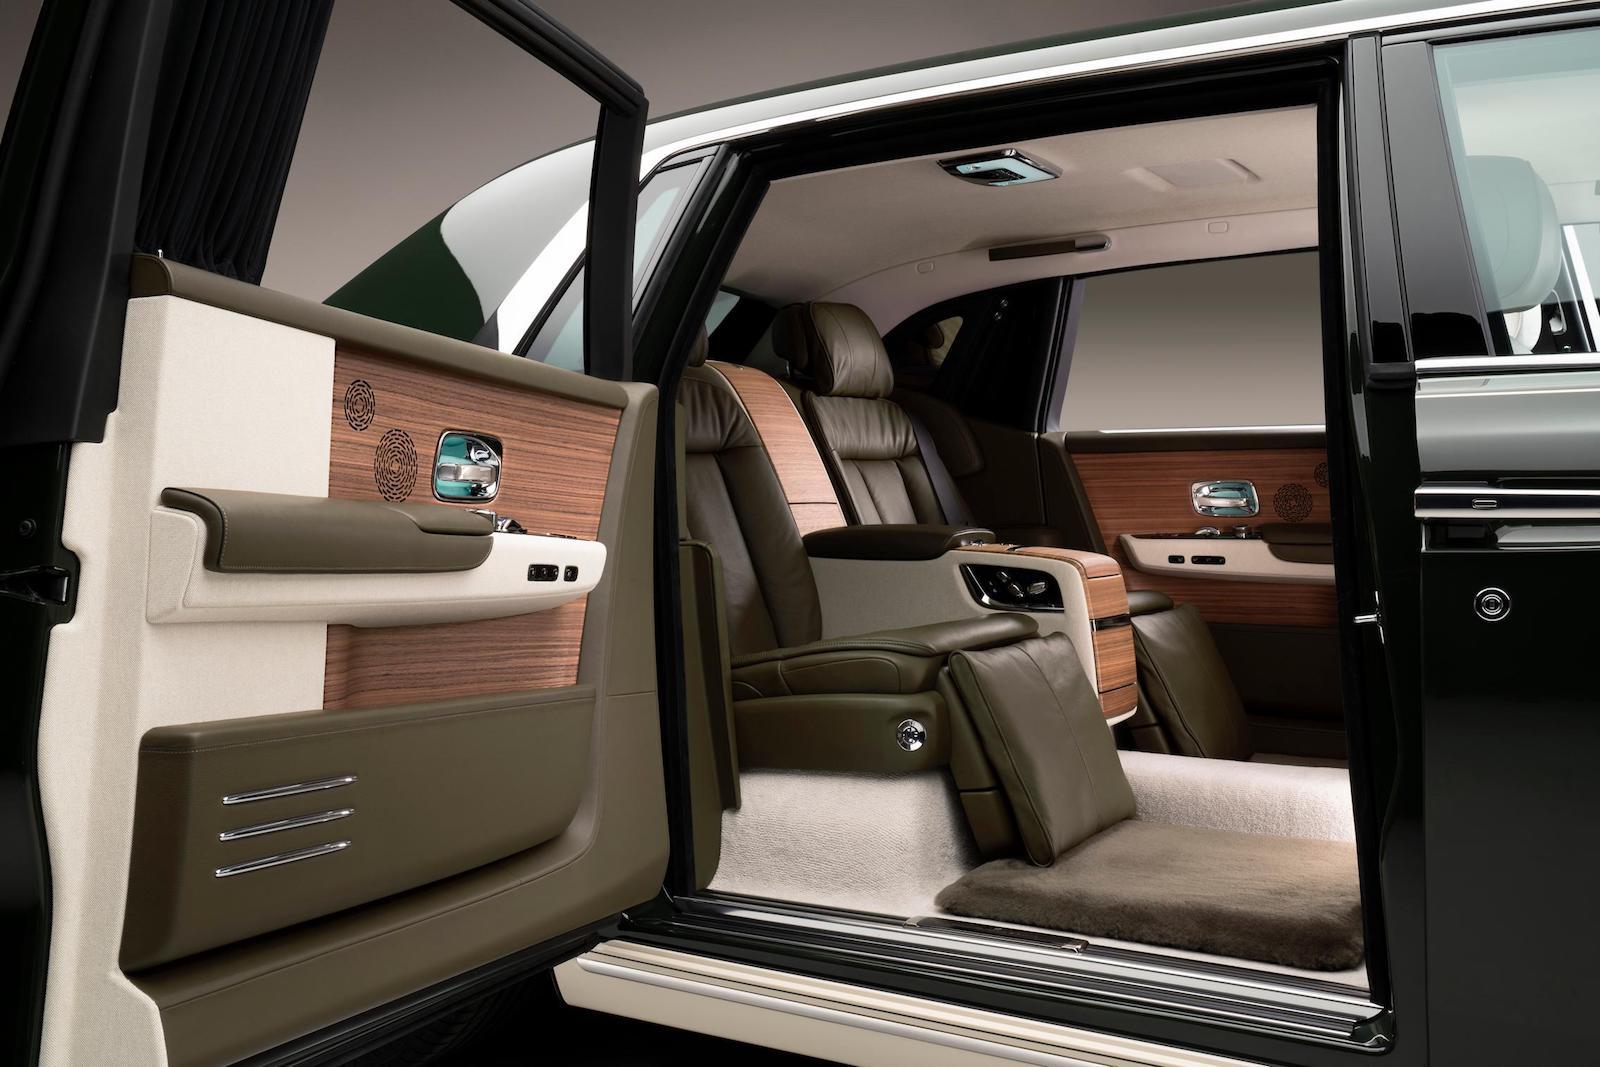 Hermes Rolls Royce-Phantom Interior